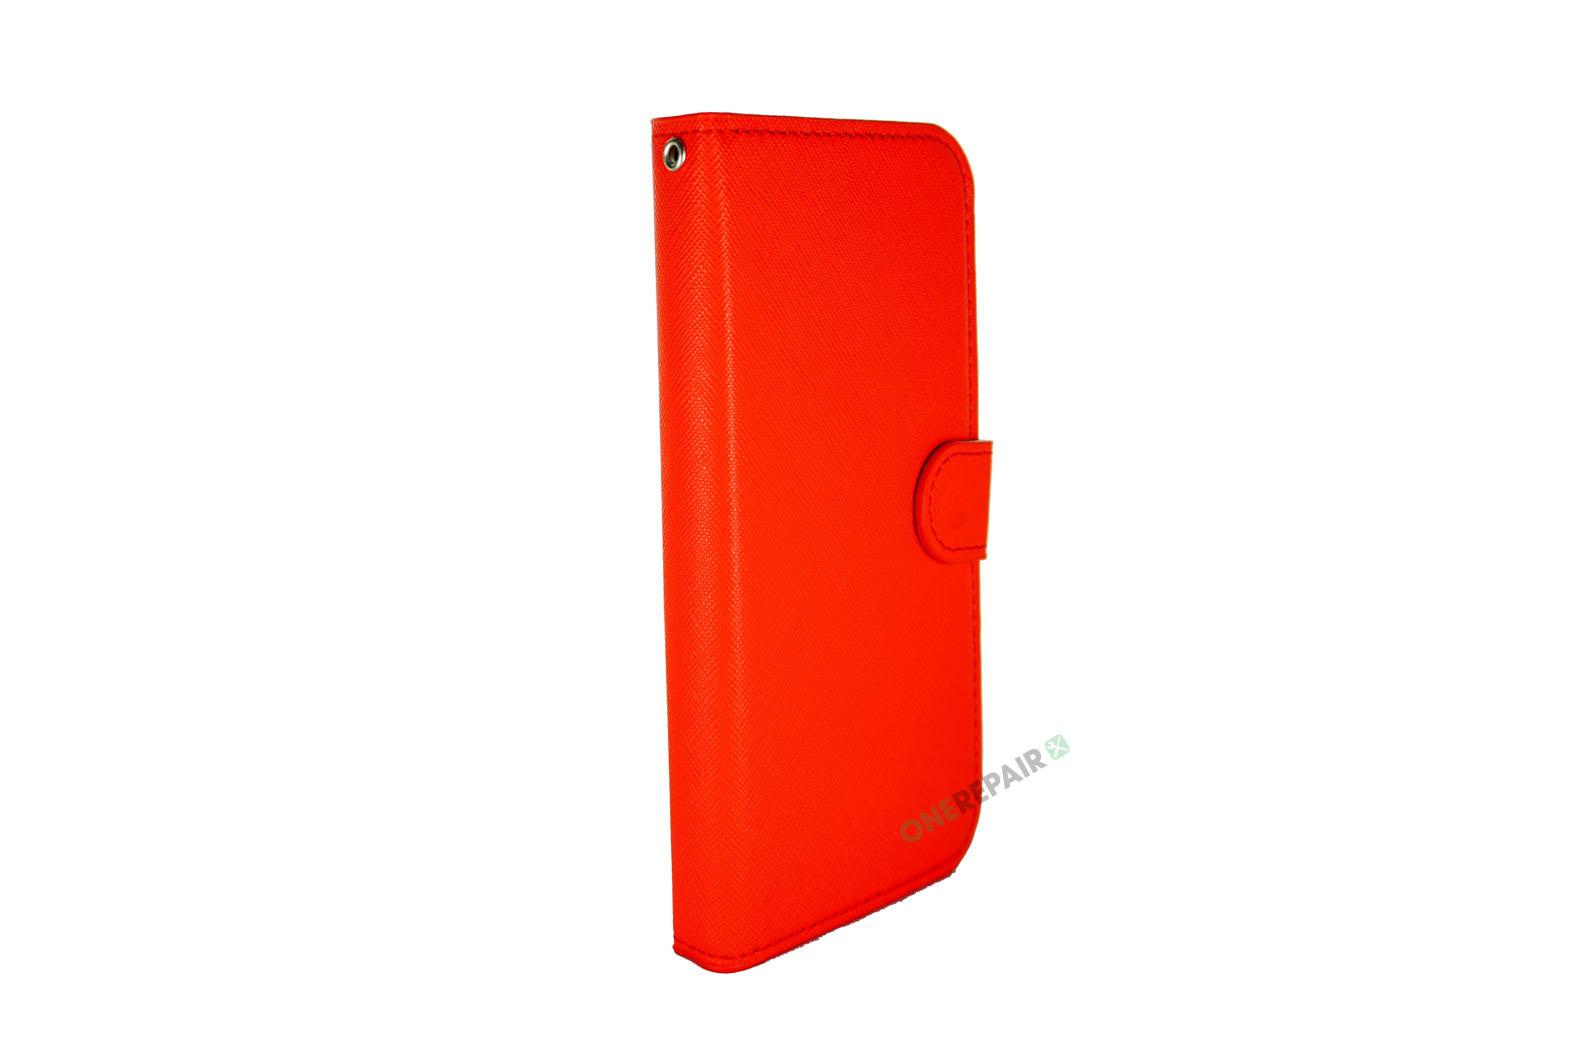 353703-003_iPhone_11_Flipcover_med_magnet_Plads_til_kort_Roed_Cover_OneRepair_00002